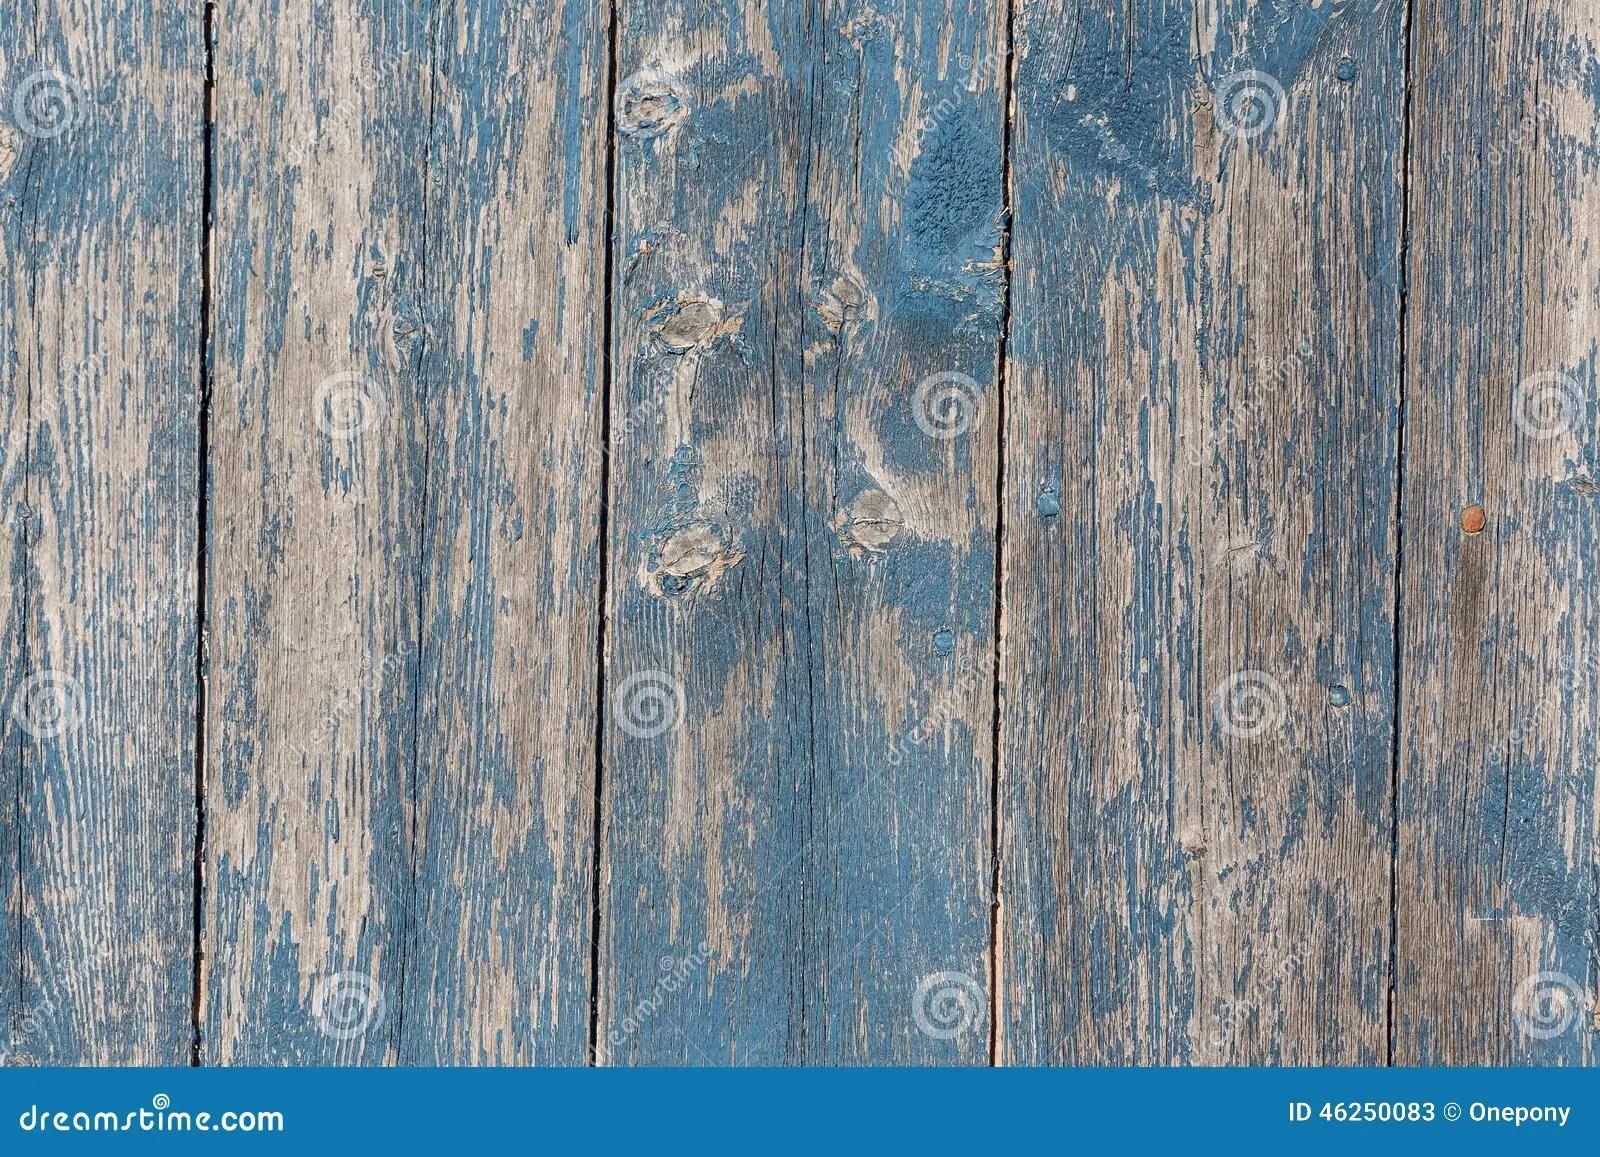 Wooden Barn Board Stock Photo Image 46250083